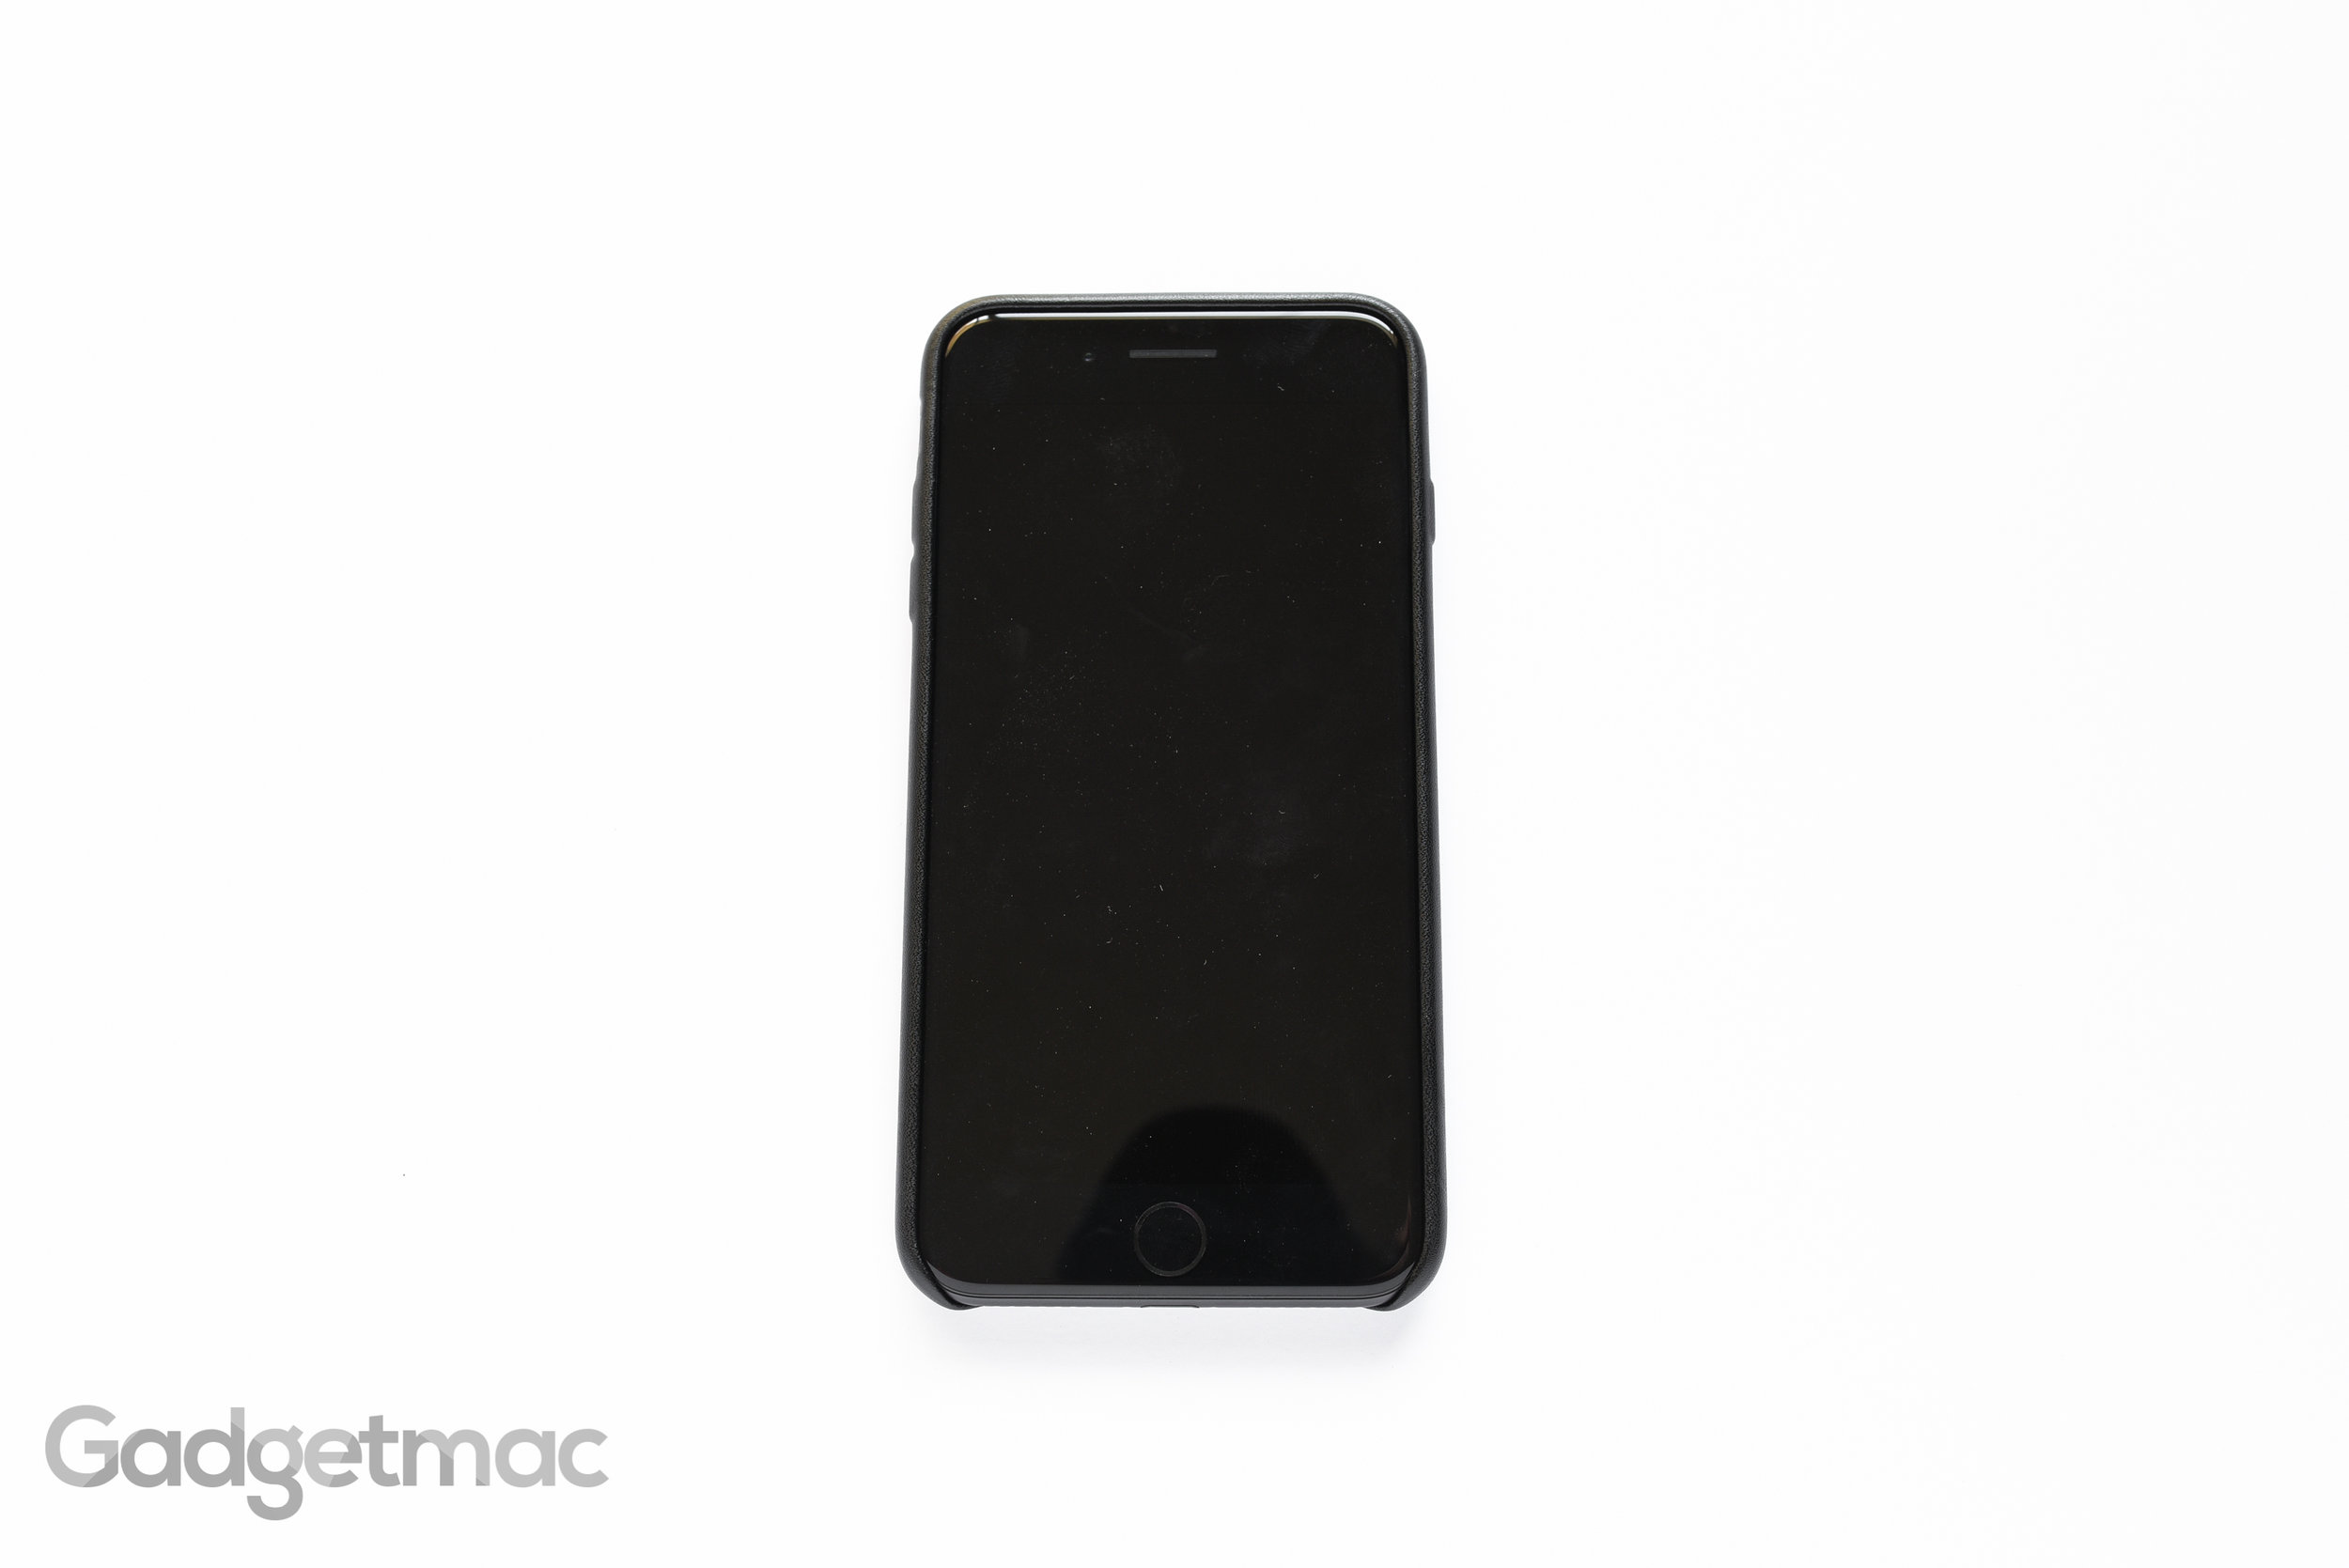 amazonbasics-iphone-7-plus-case-front.jpg